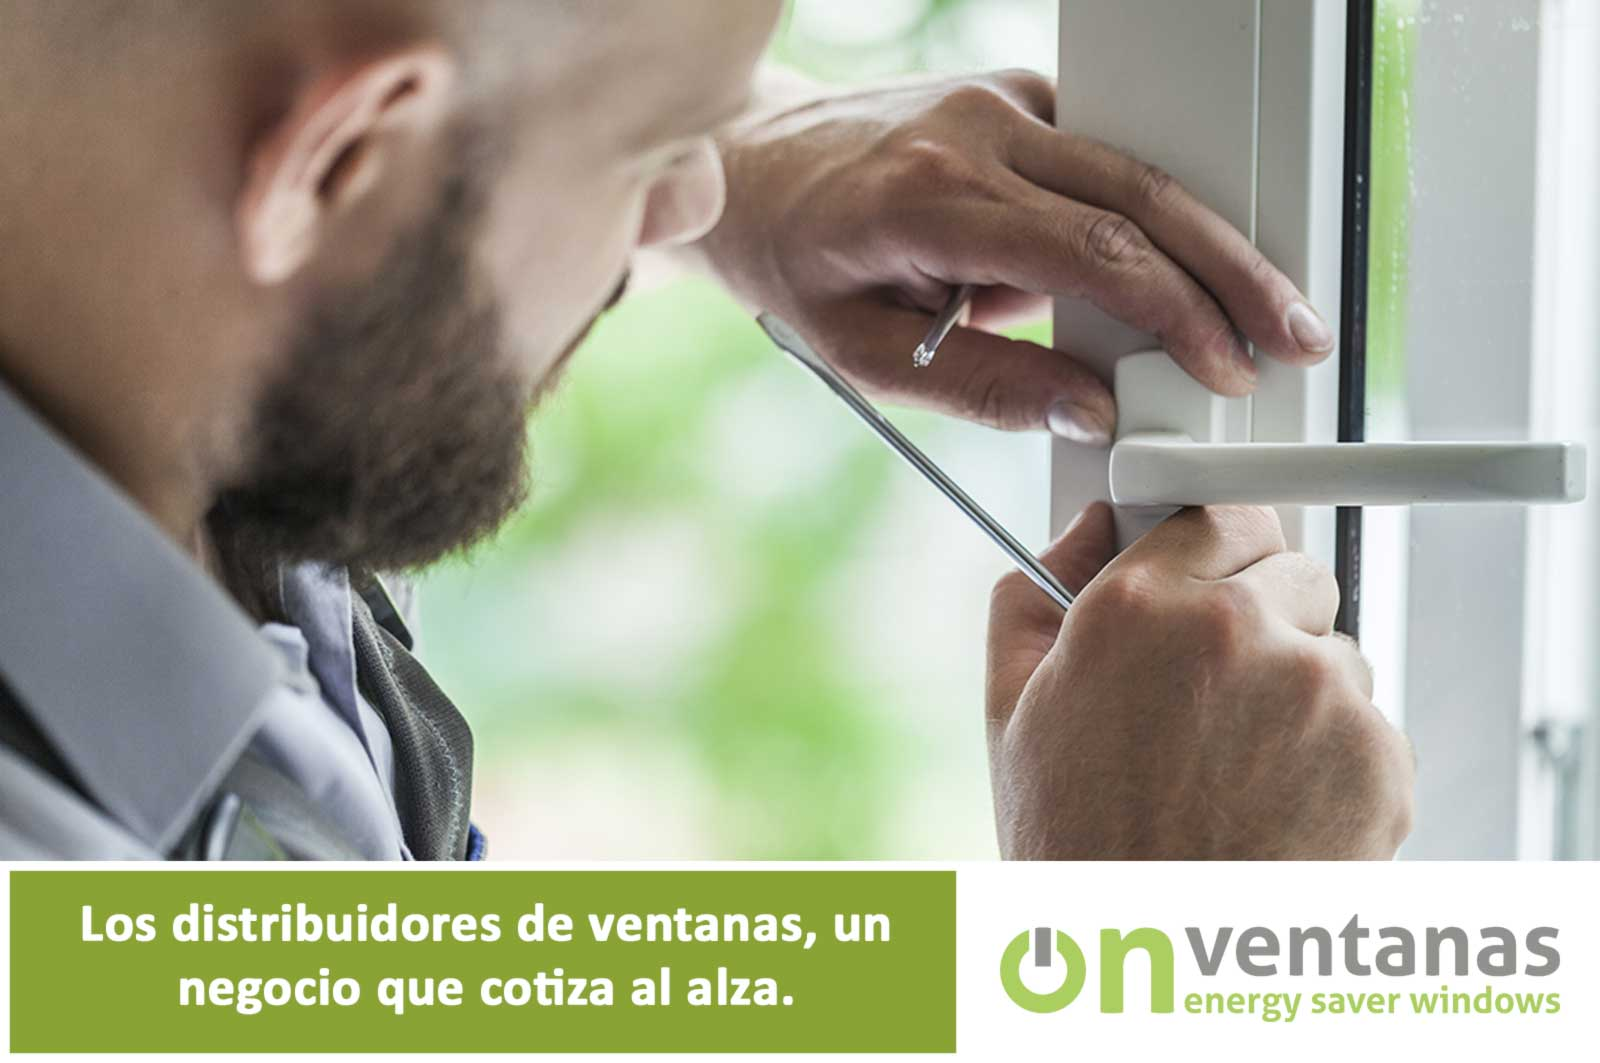 Éxito distribuidores ventanas